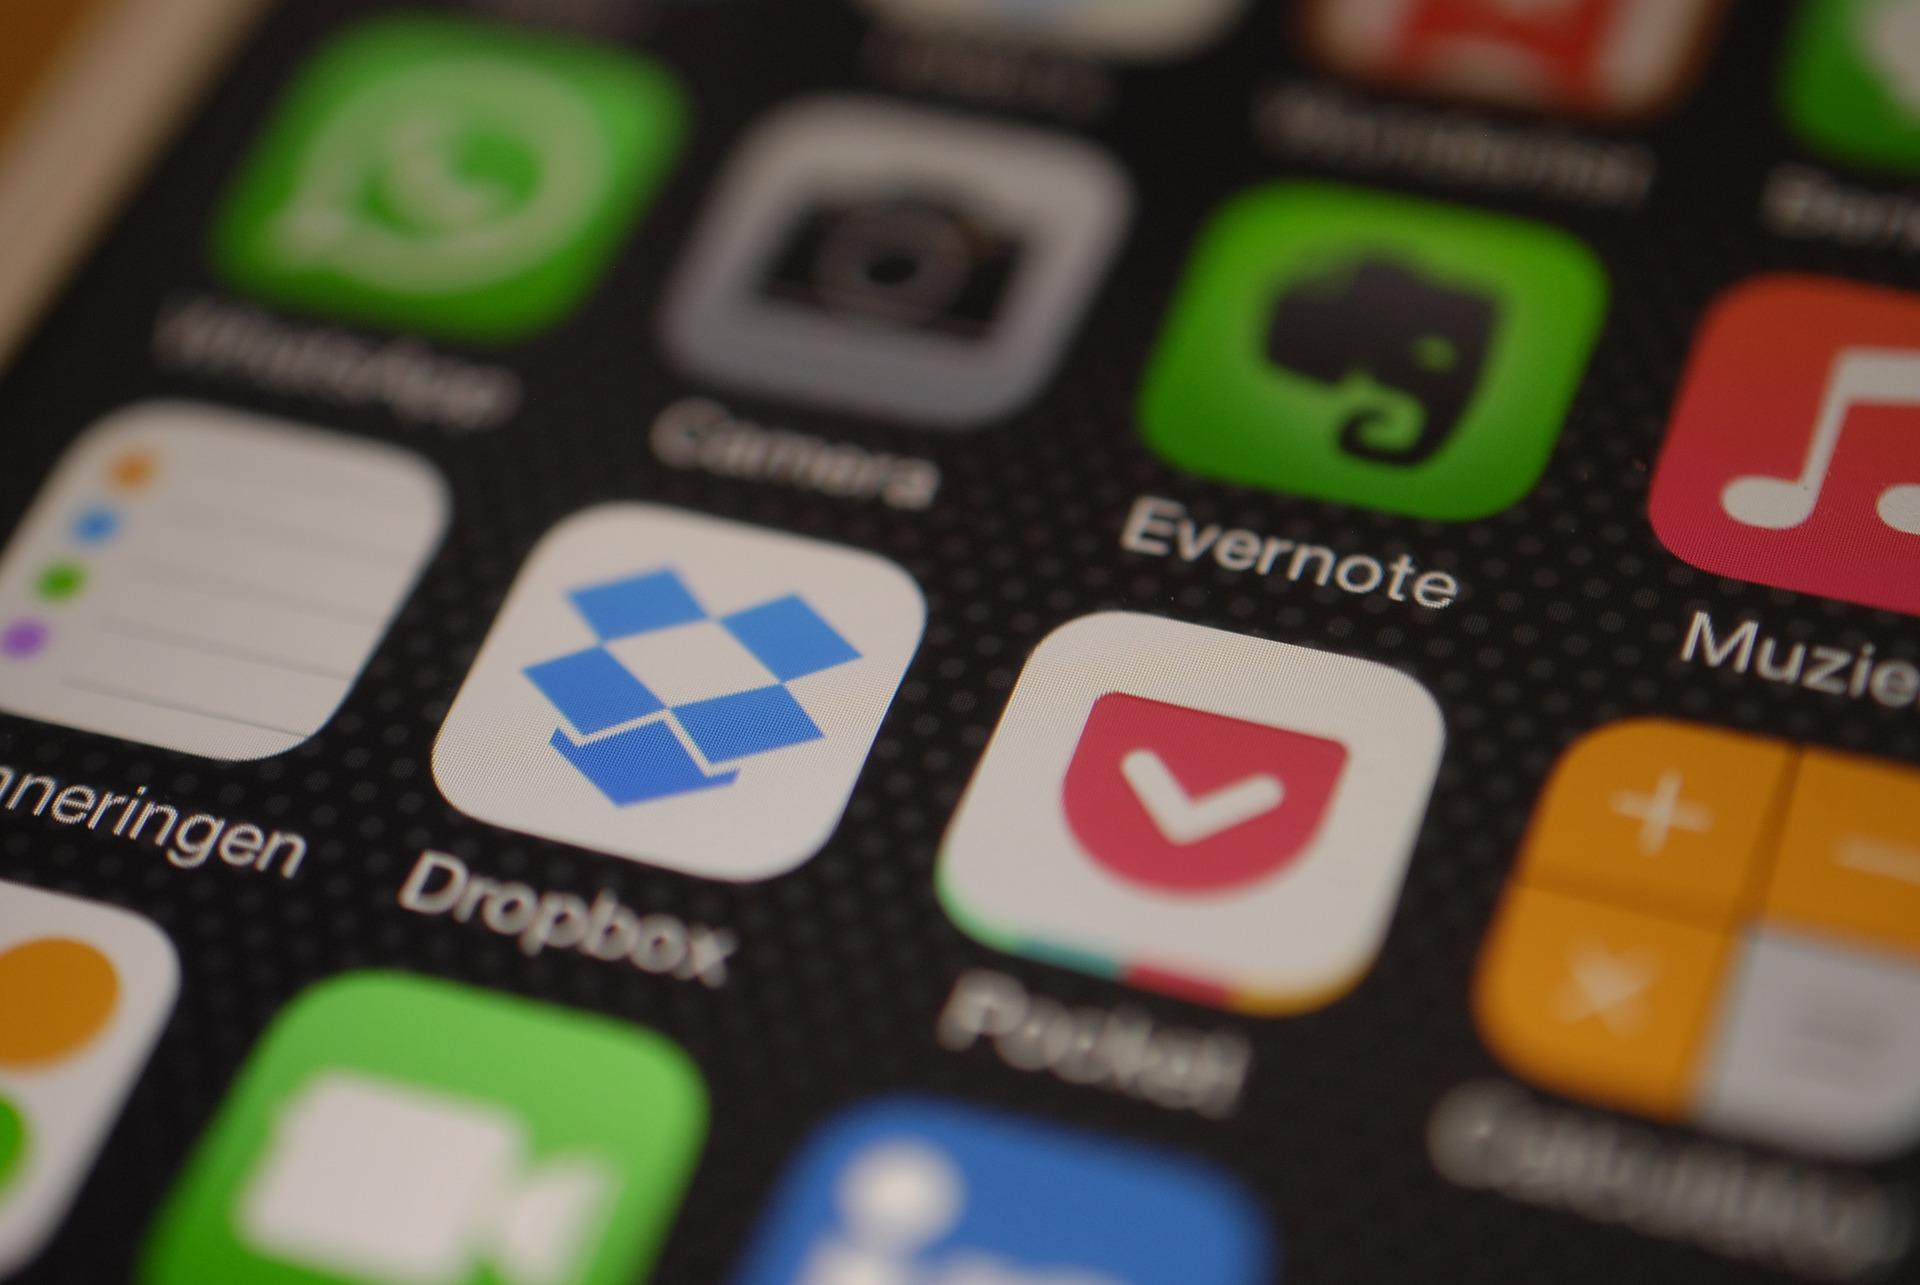 A Good Alternative to Solve Your Dropbox Problem